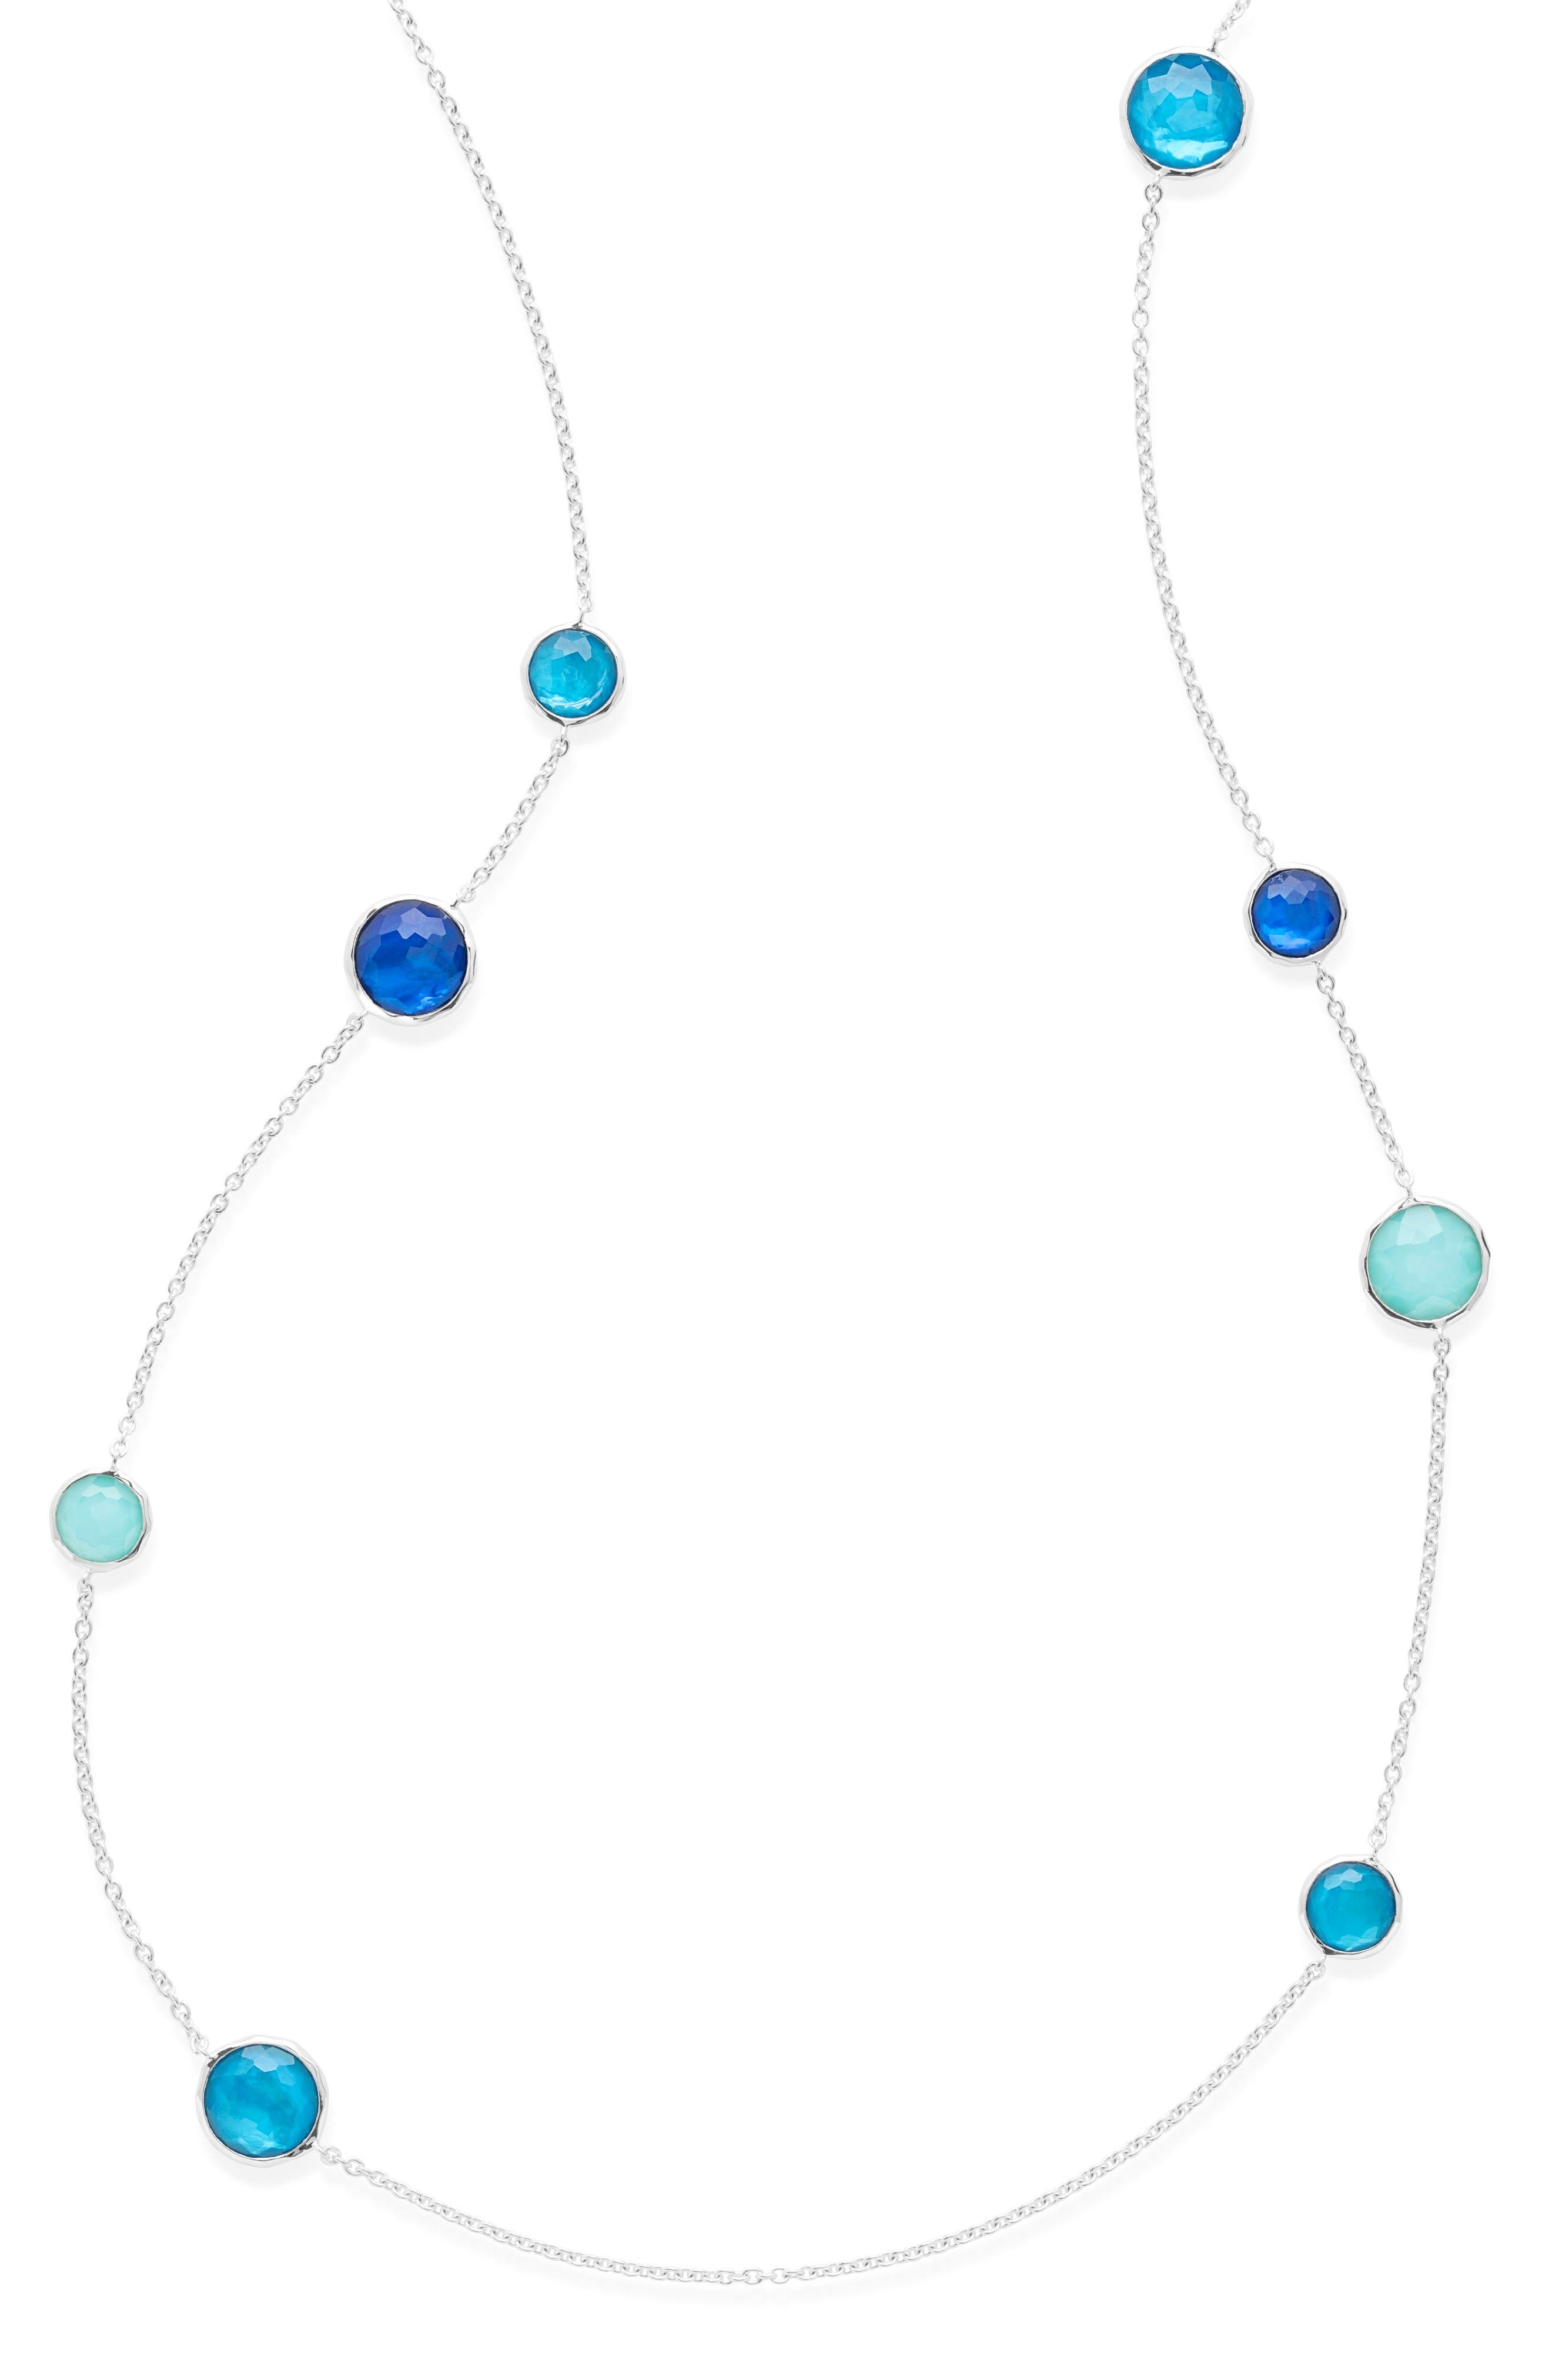 Ippolita Wonderland Station Necklace